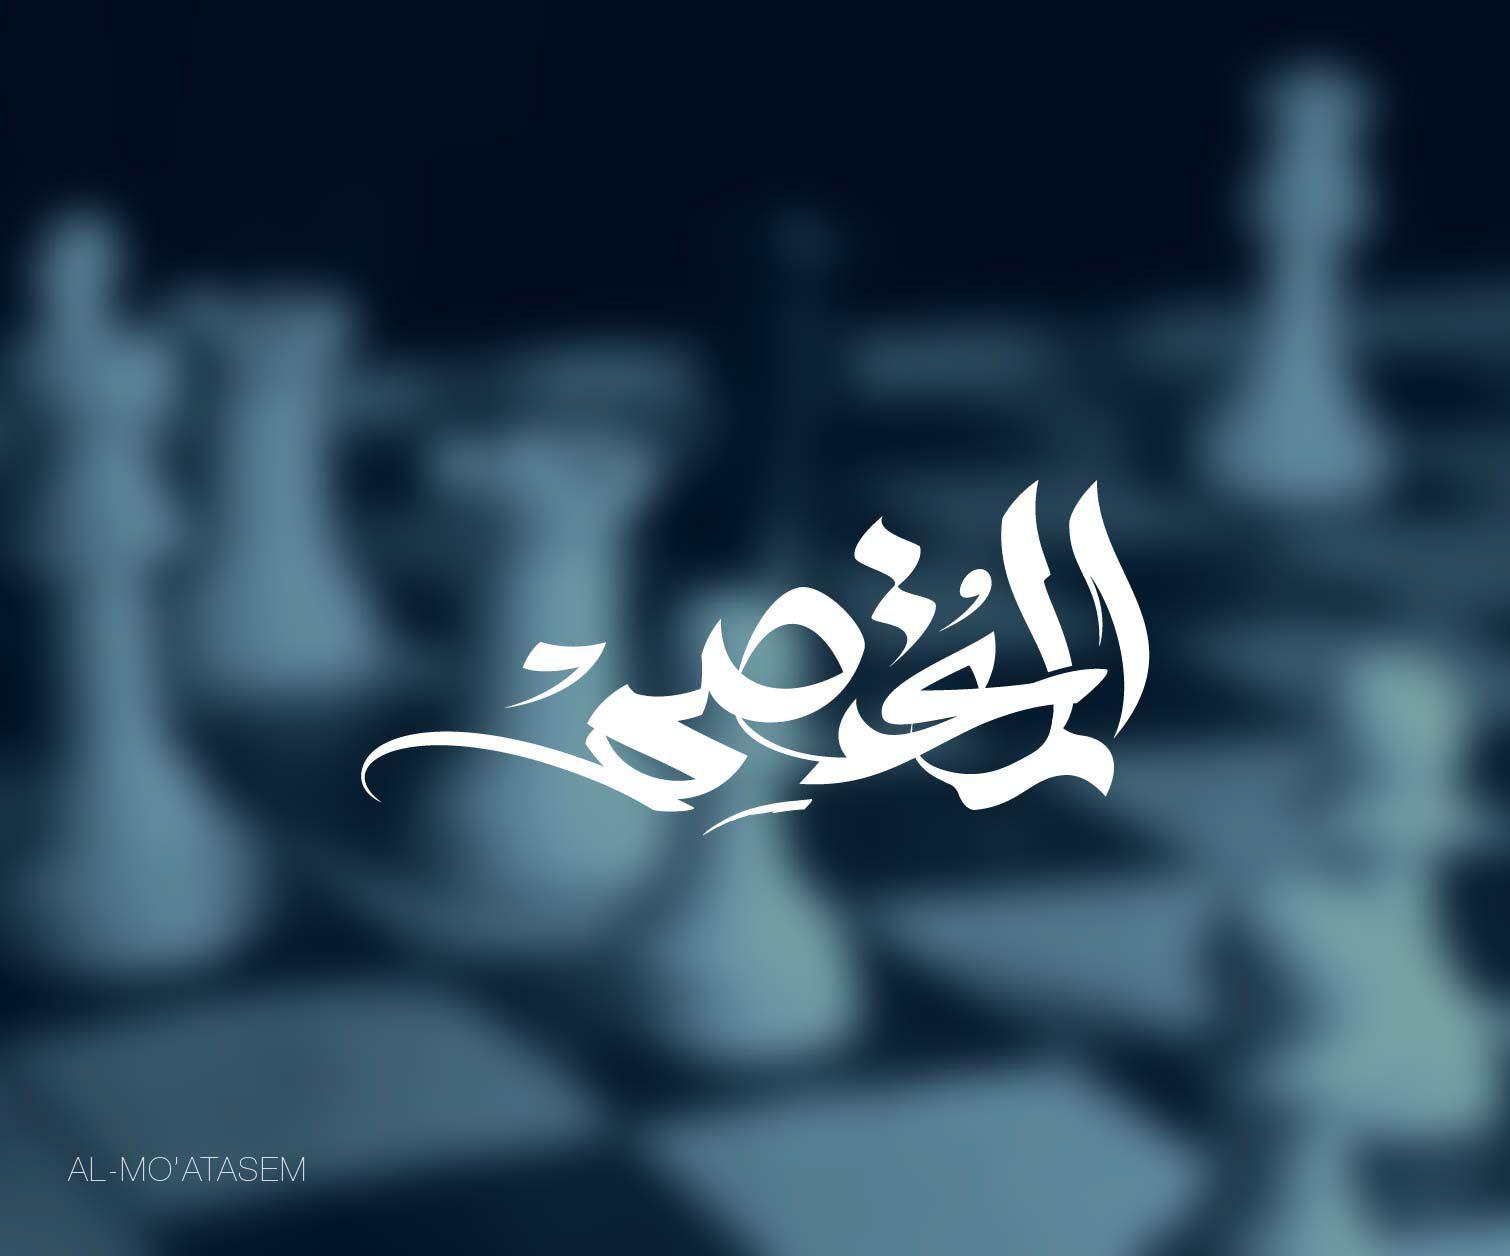 Calligraphy names speed qalam style edp pinterest